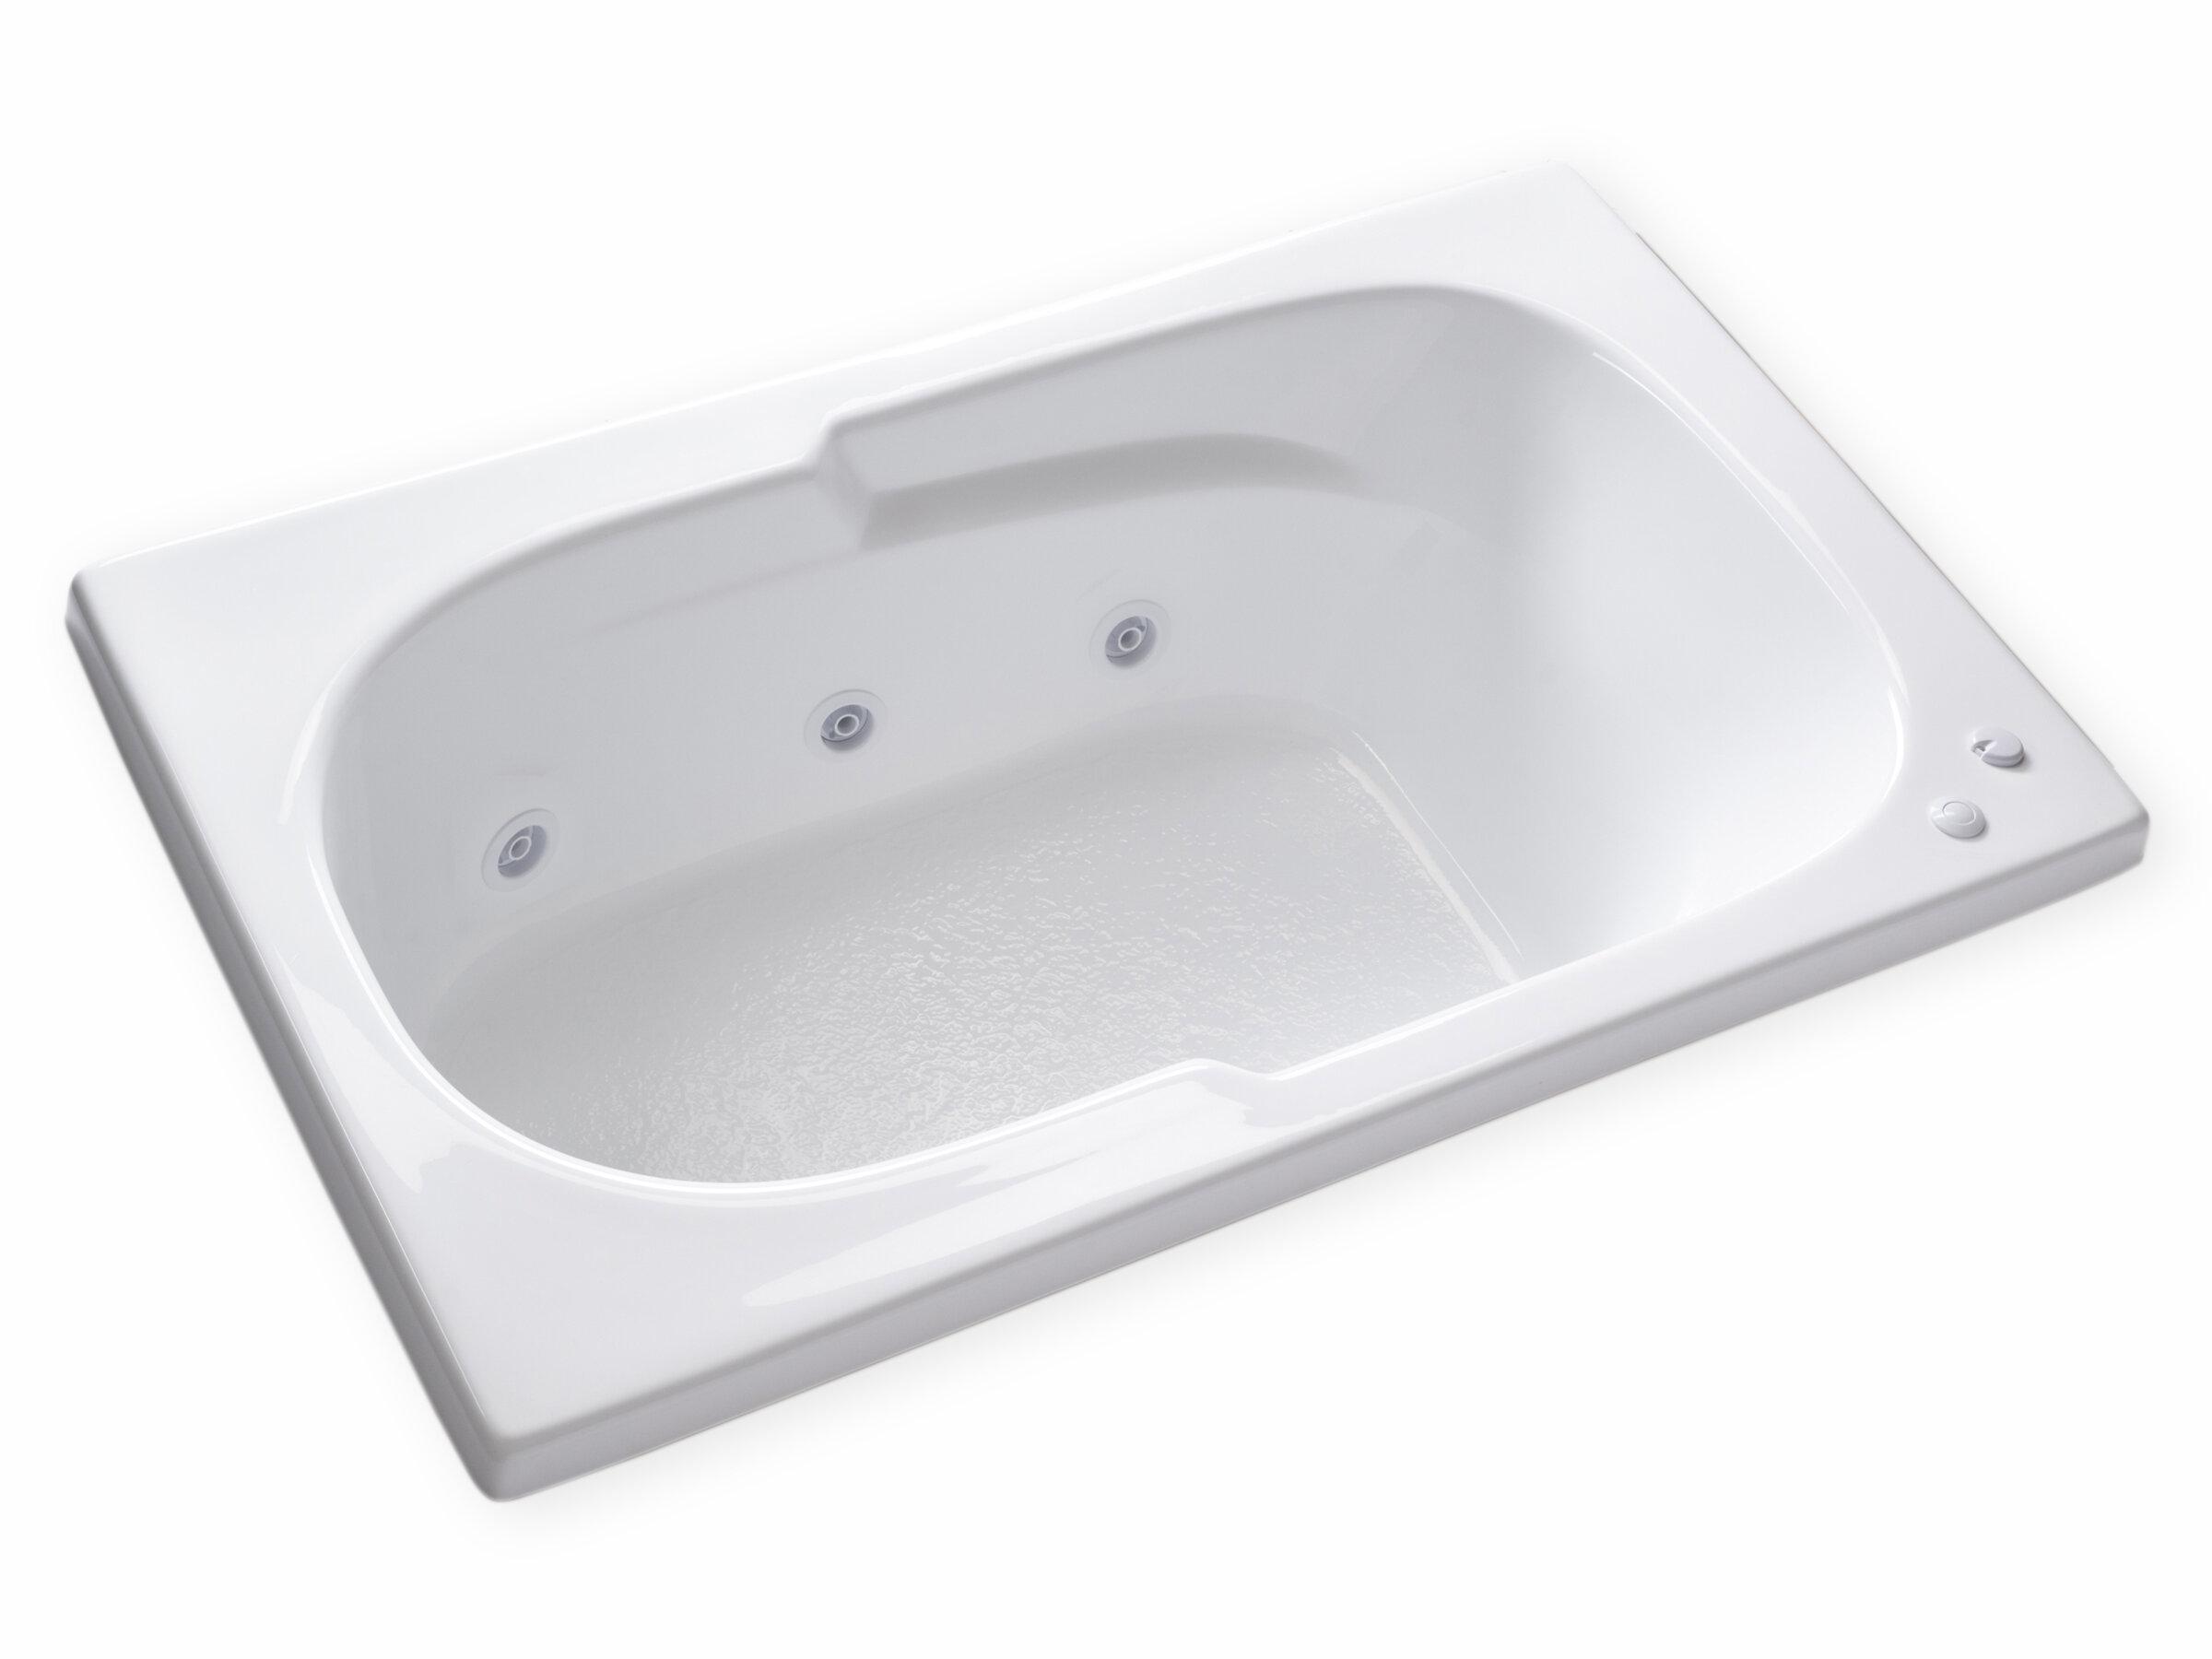 Carver Tubs Hygienic Aqua Massage 60\